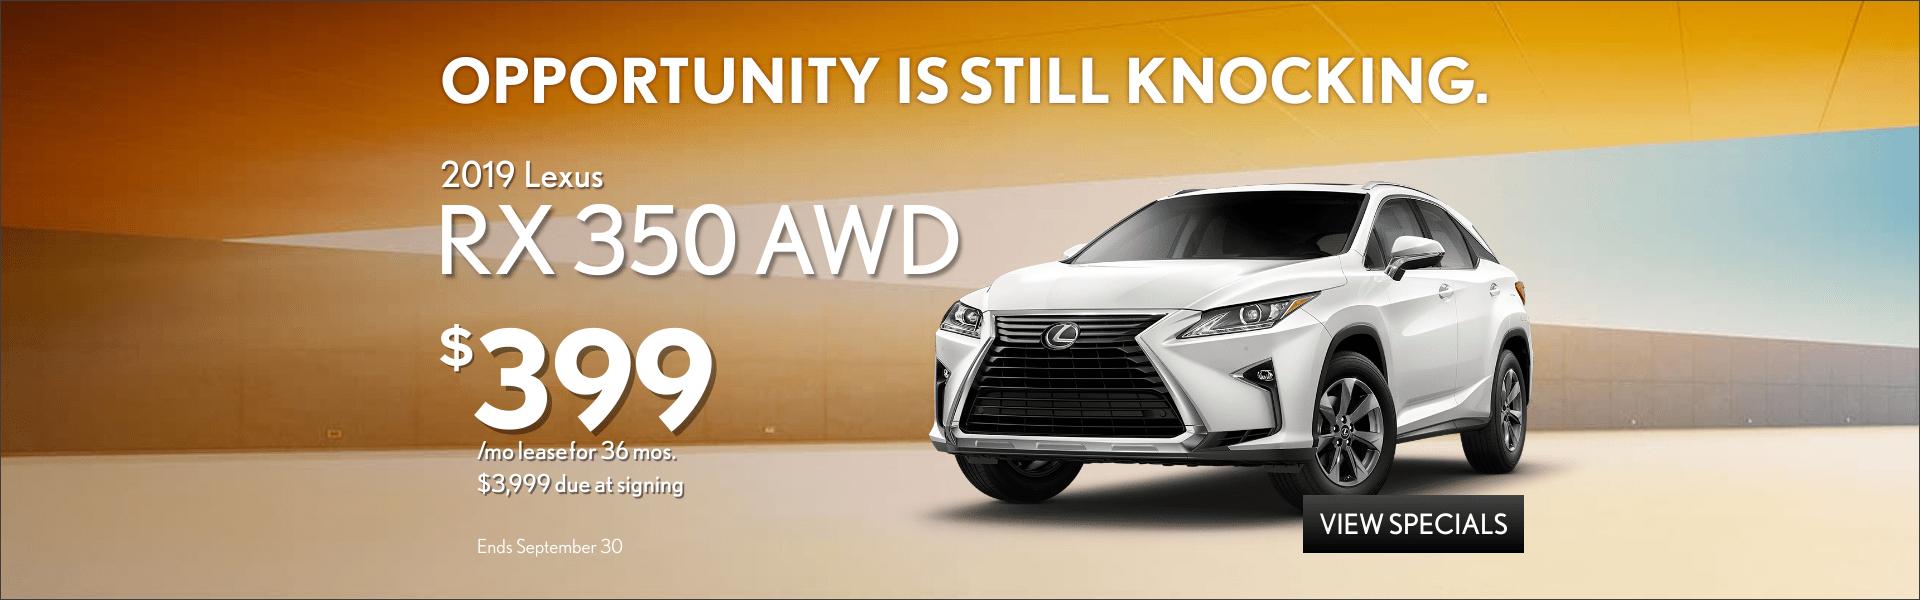 2019 RX 350 AWD